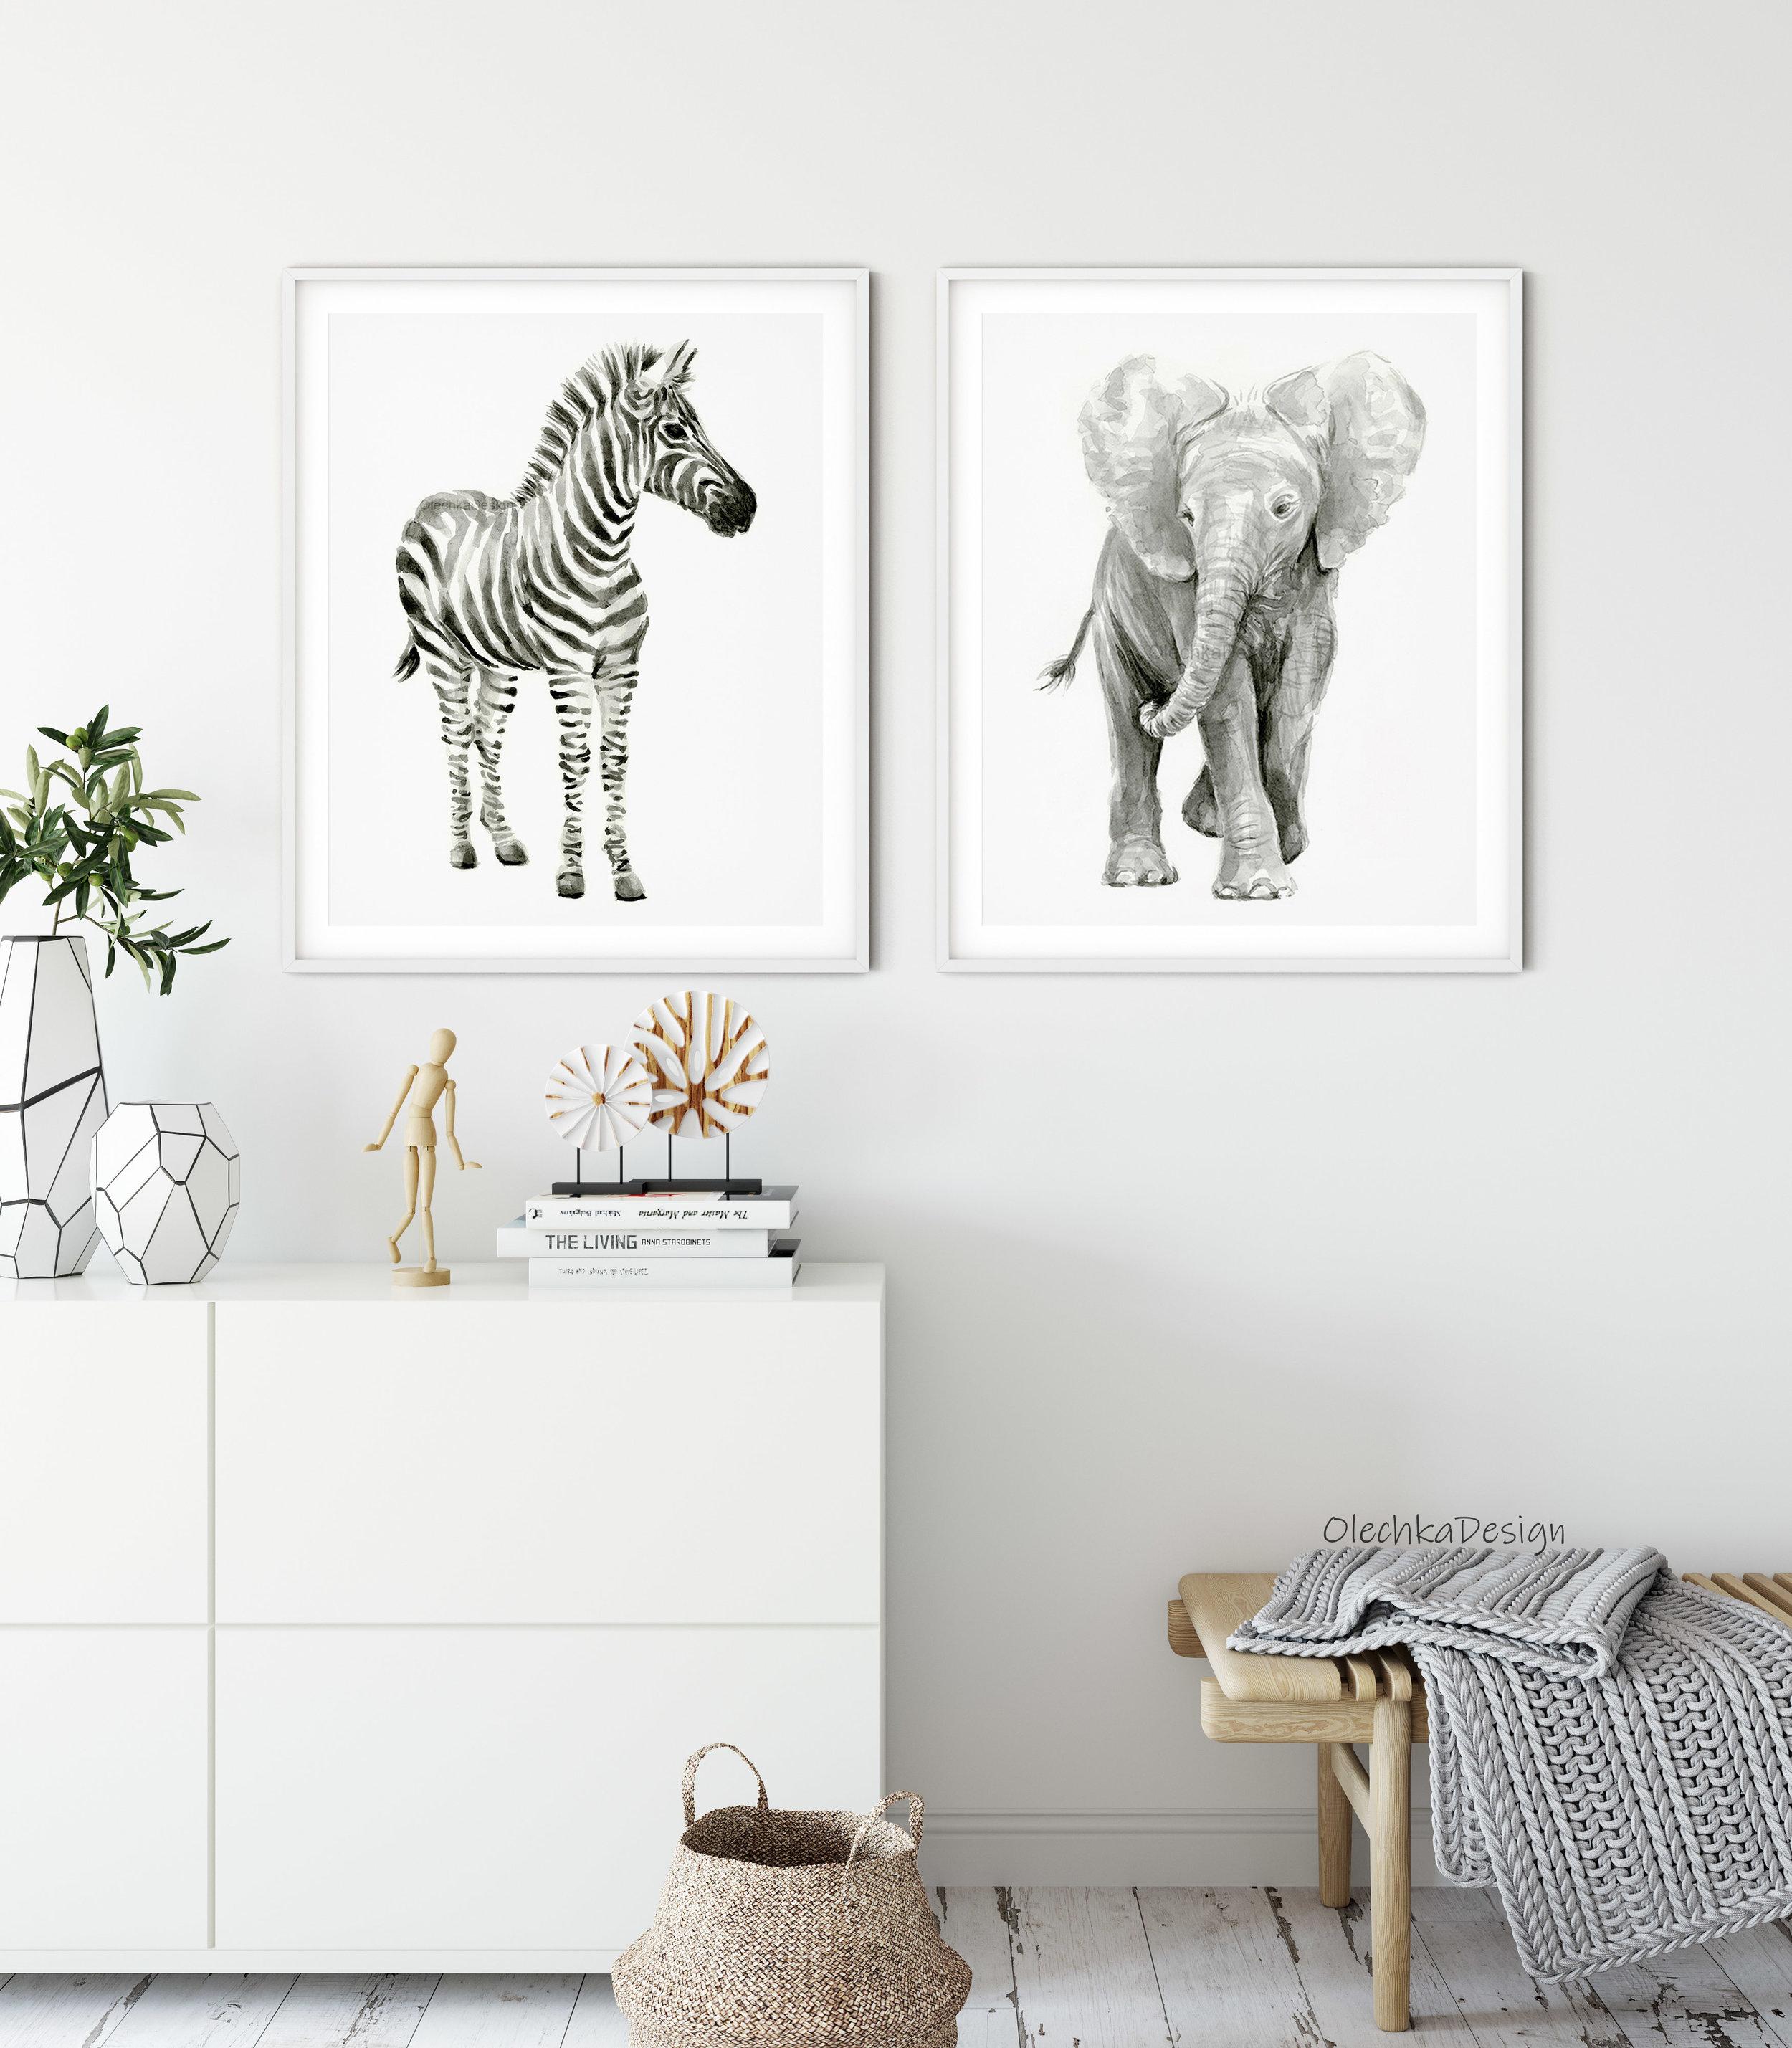 nursery-wall-art-zebra-elephant-watercolor-prints.jpg